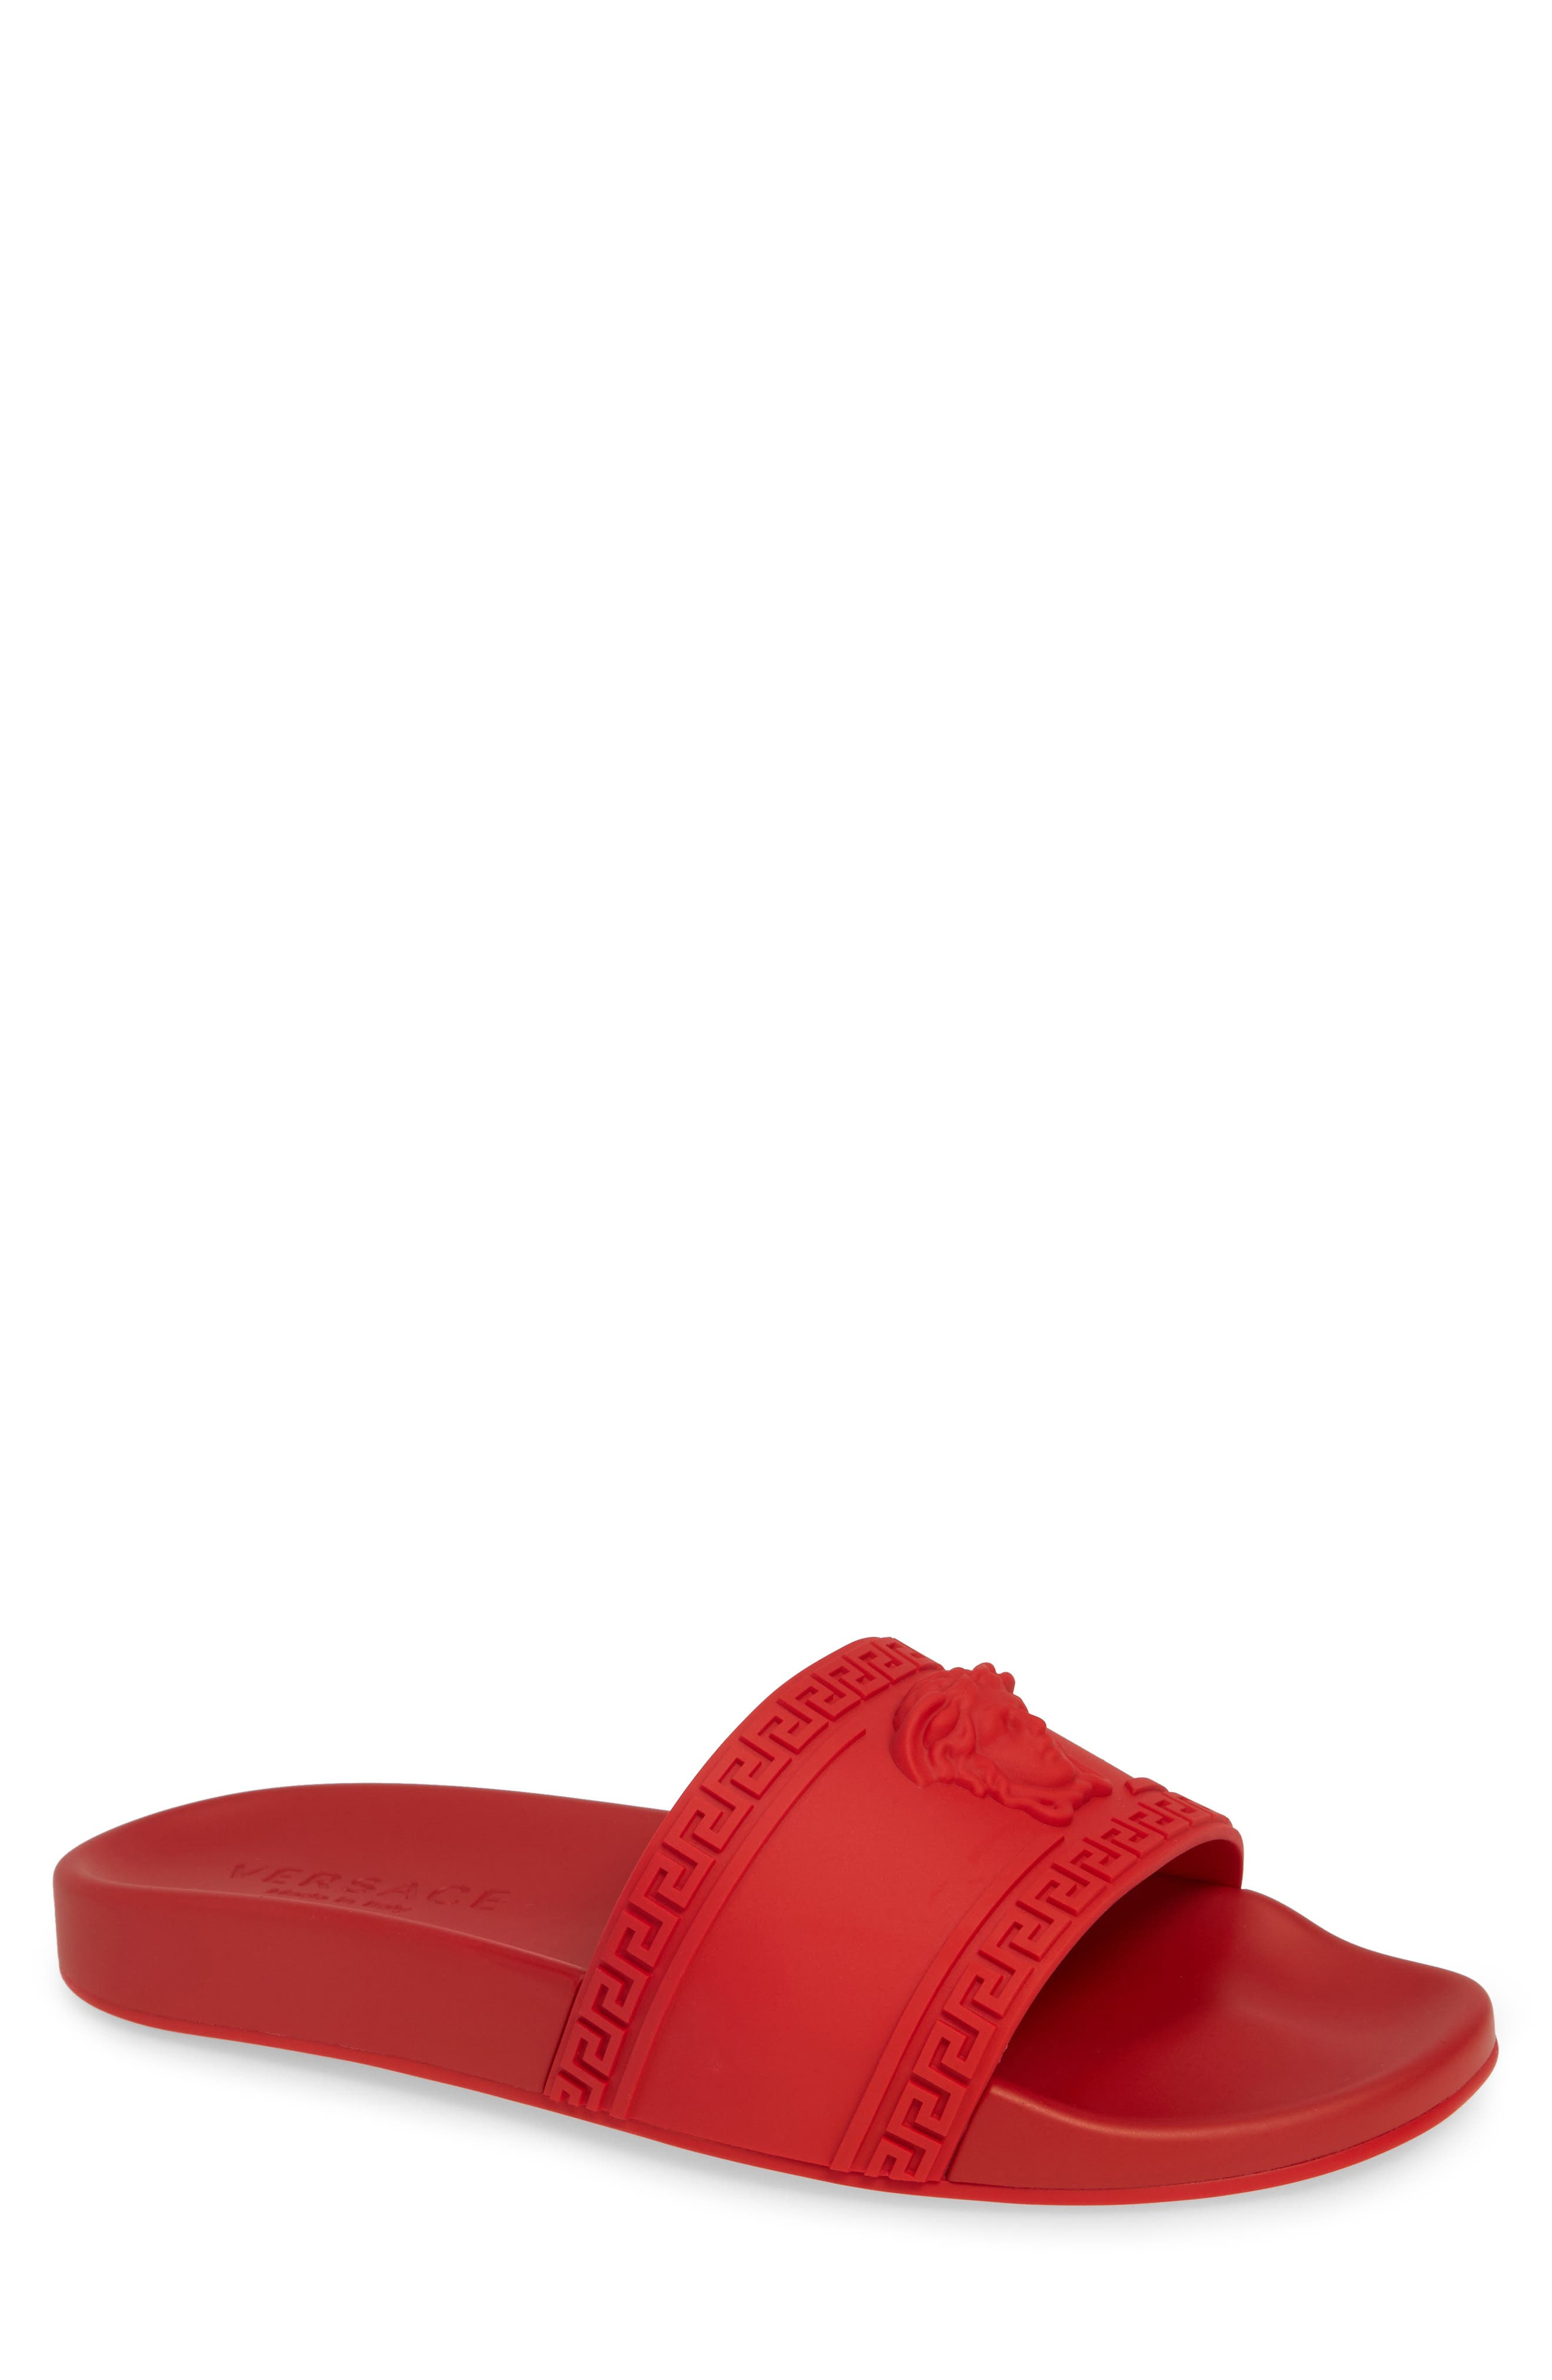 Palazzo Medusa Slide Sandal,                             Main thumbnail 1, color,                             RED